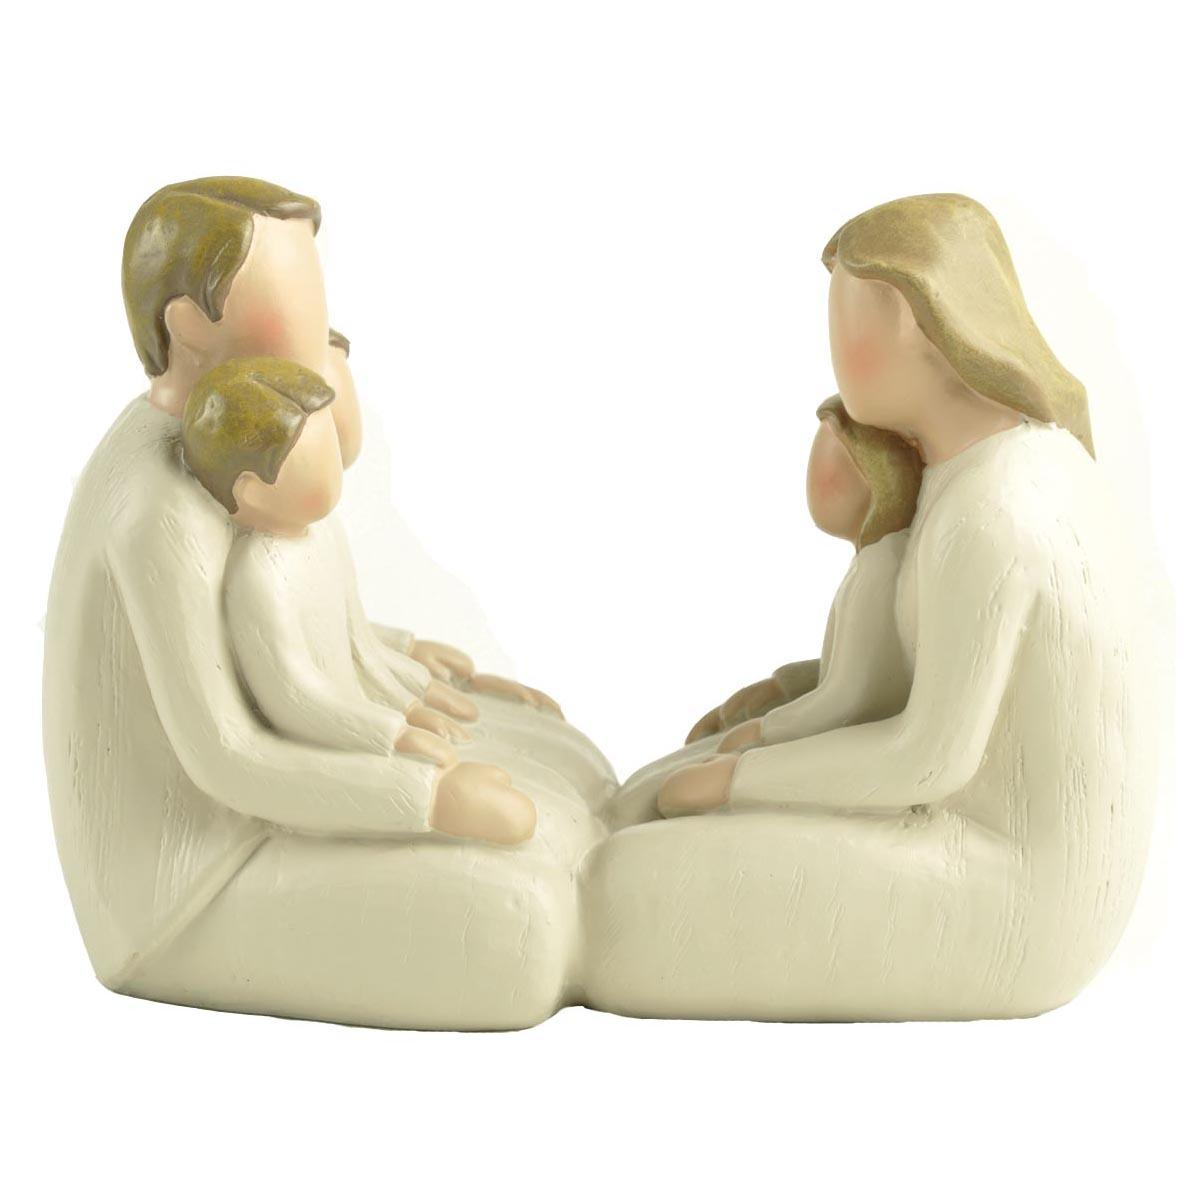 Ennas miniature funny wedding cake toppers high-quality birthday decor